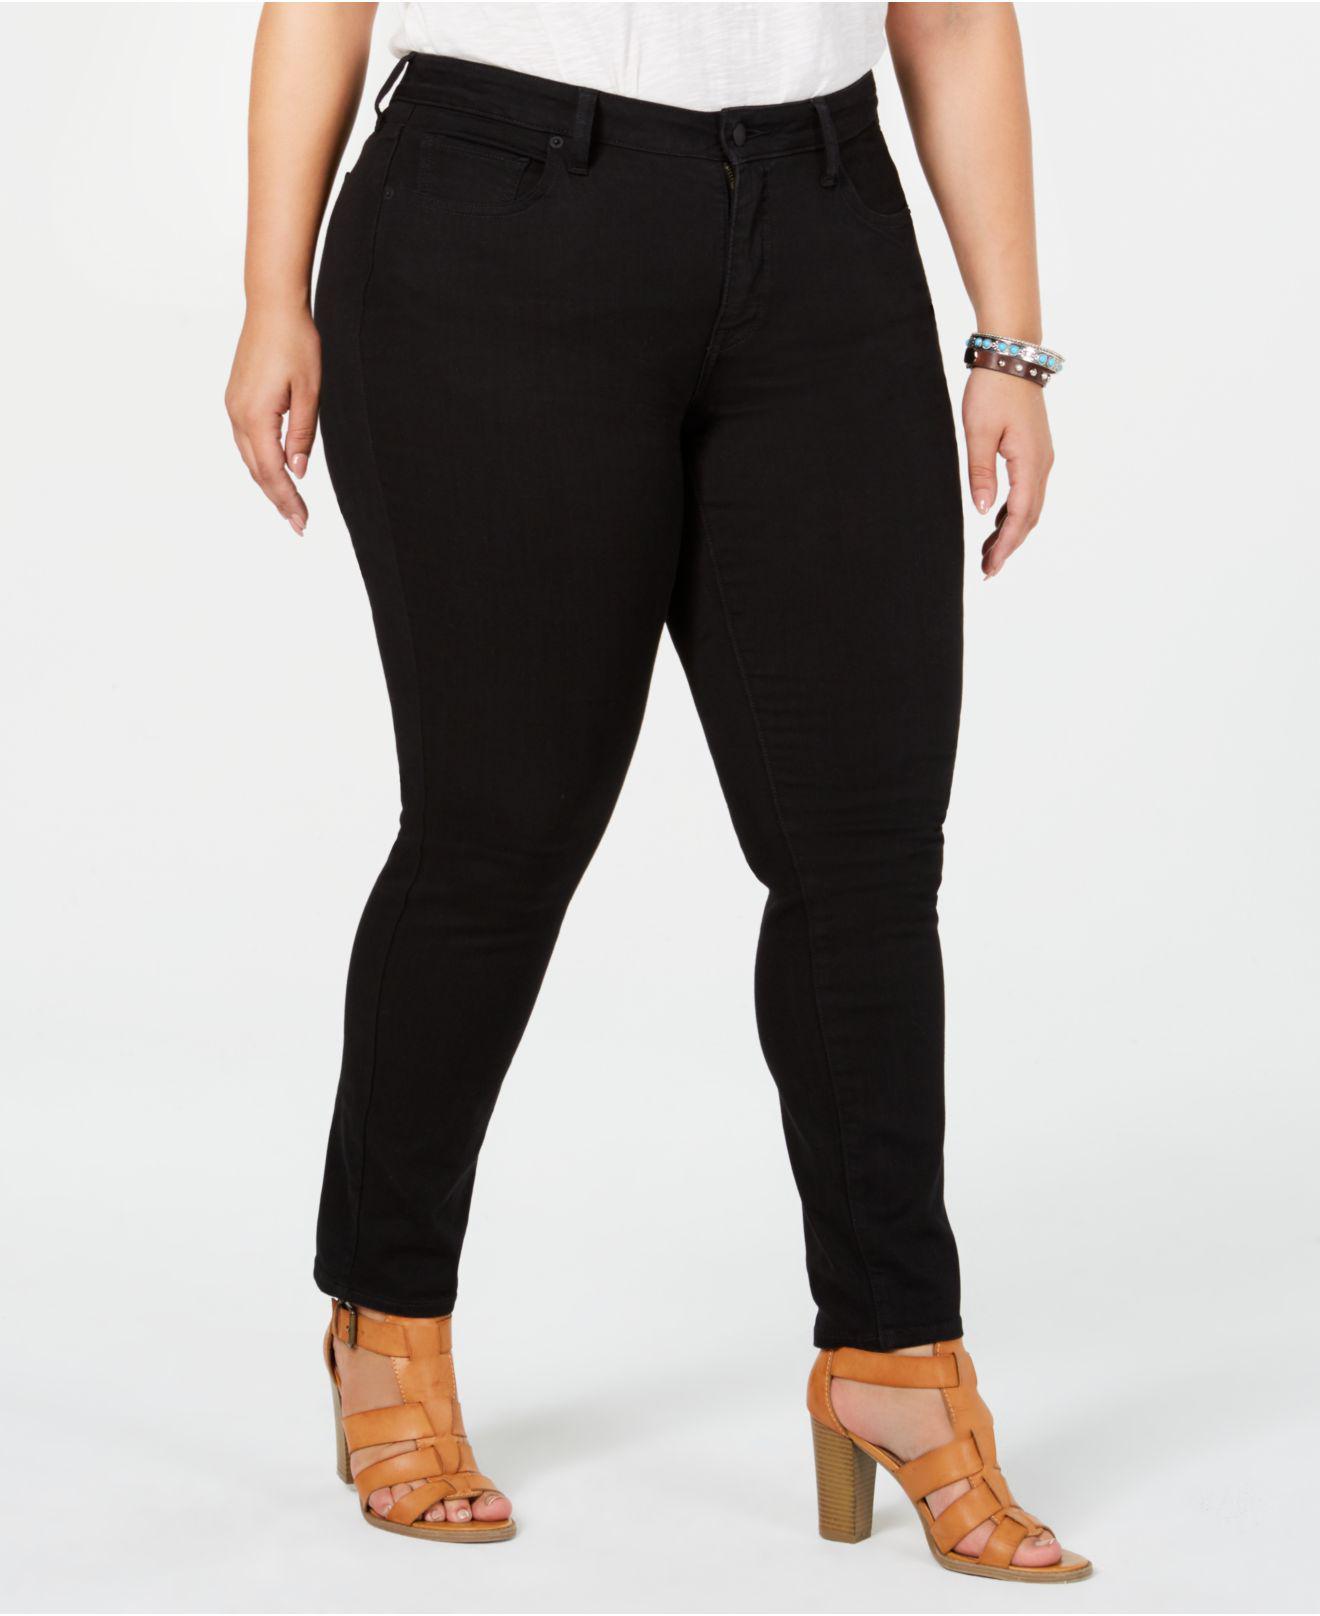 bdebcc4c78ddb Lyst - Lucky Brand Trendy Plus Size Lolita Skinny Jeans in Black